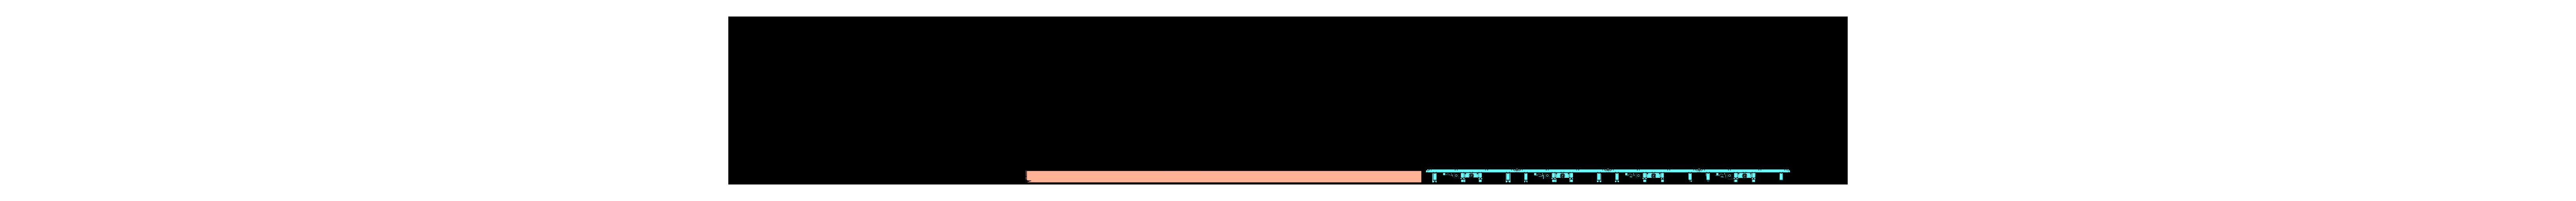 Processo di uscita ondulatore